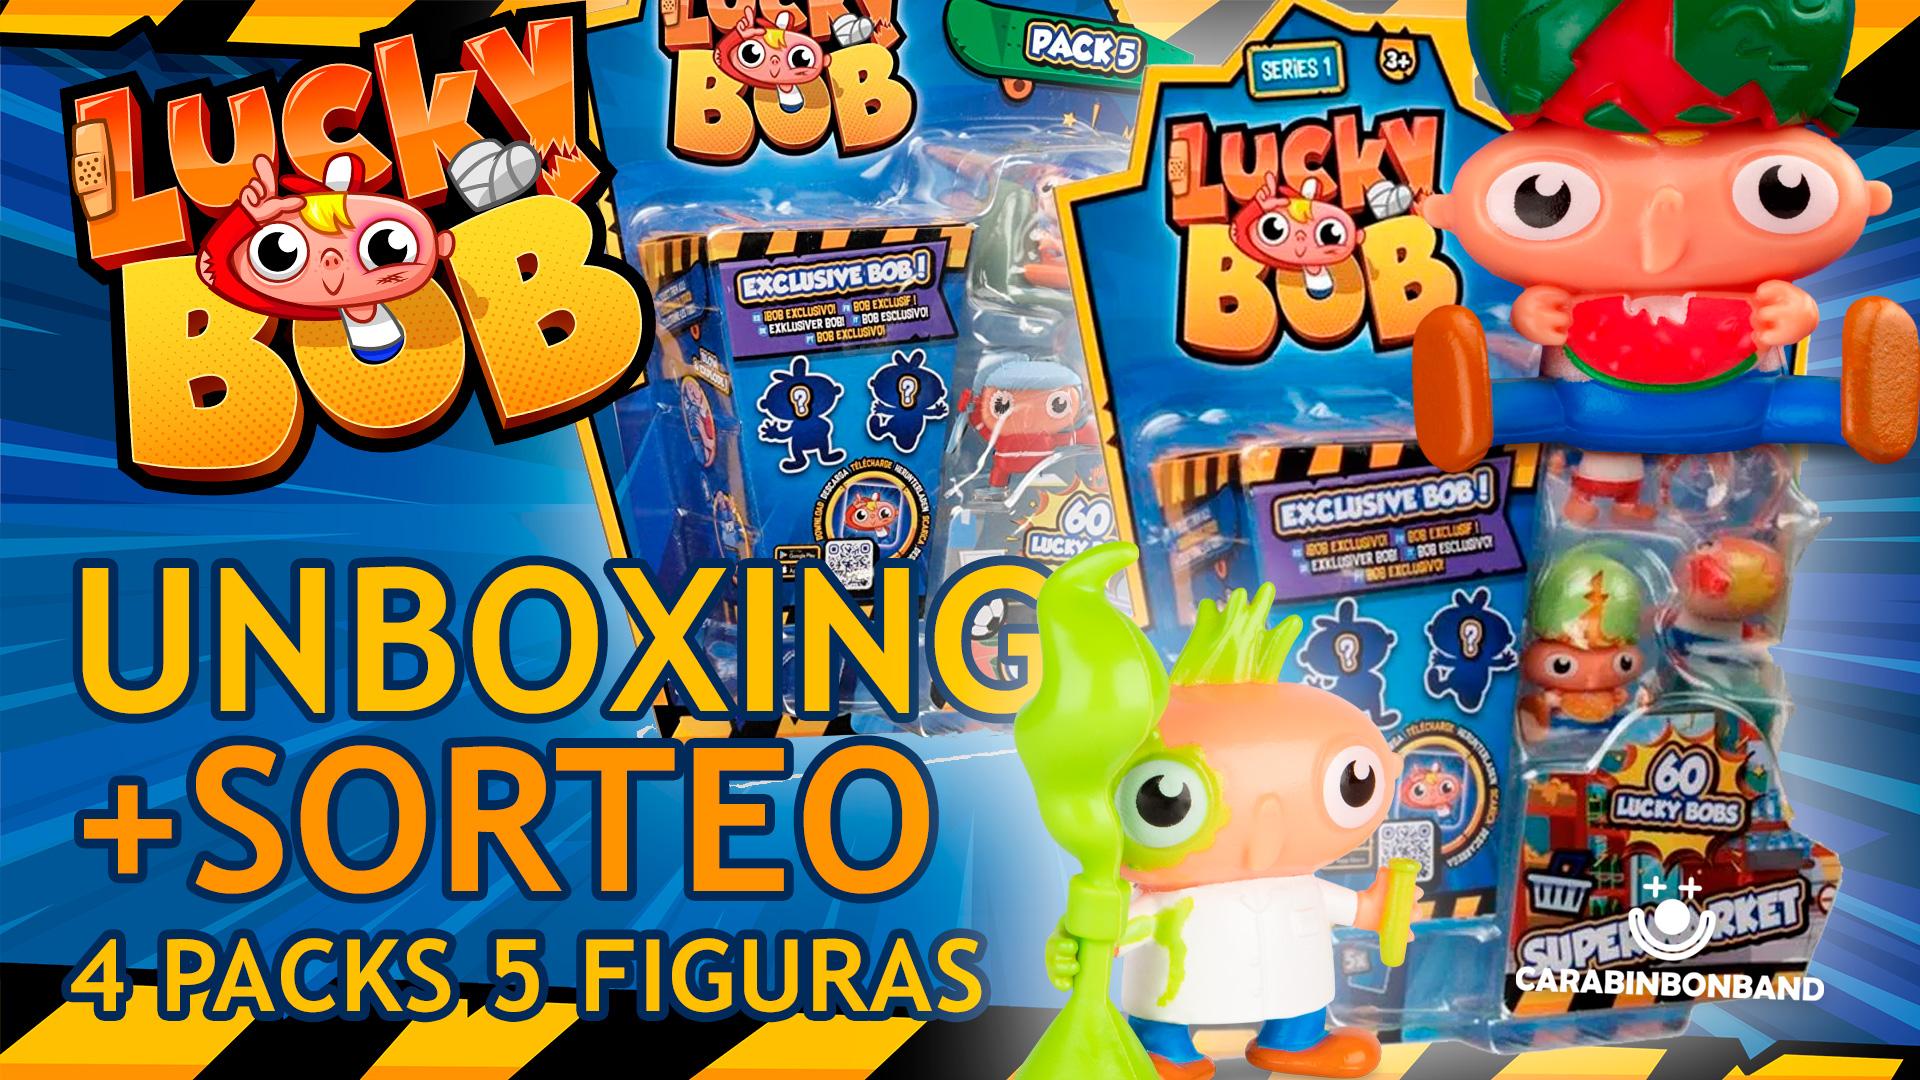 LUCKY BOB - UNBOXING Y SORTEO PACKS 5 FIGURAS SERIES 1